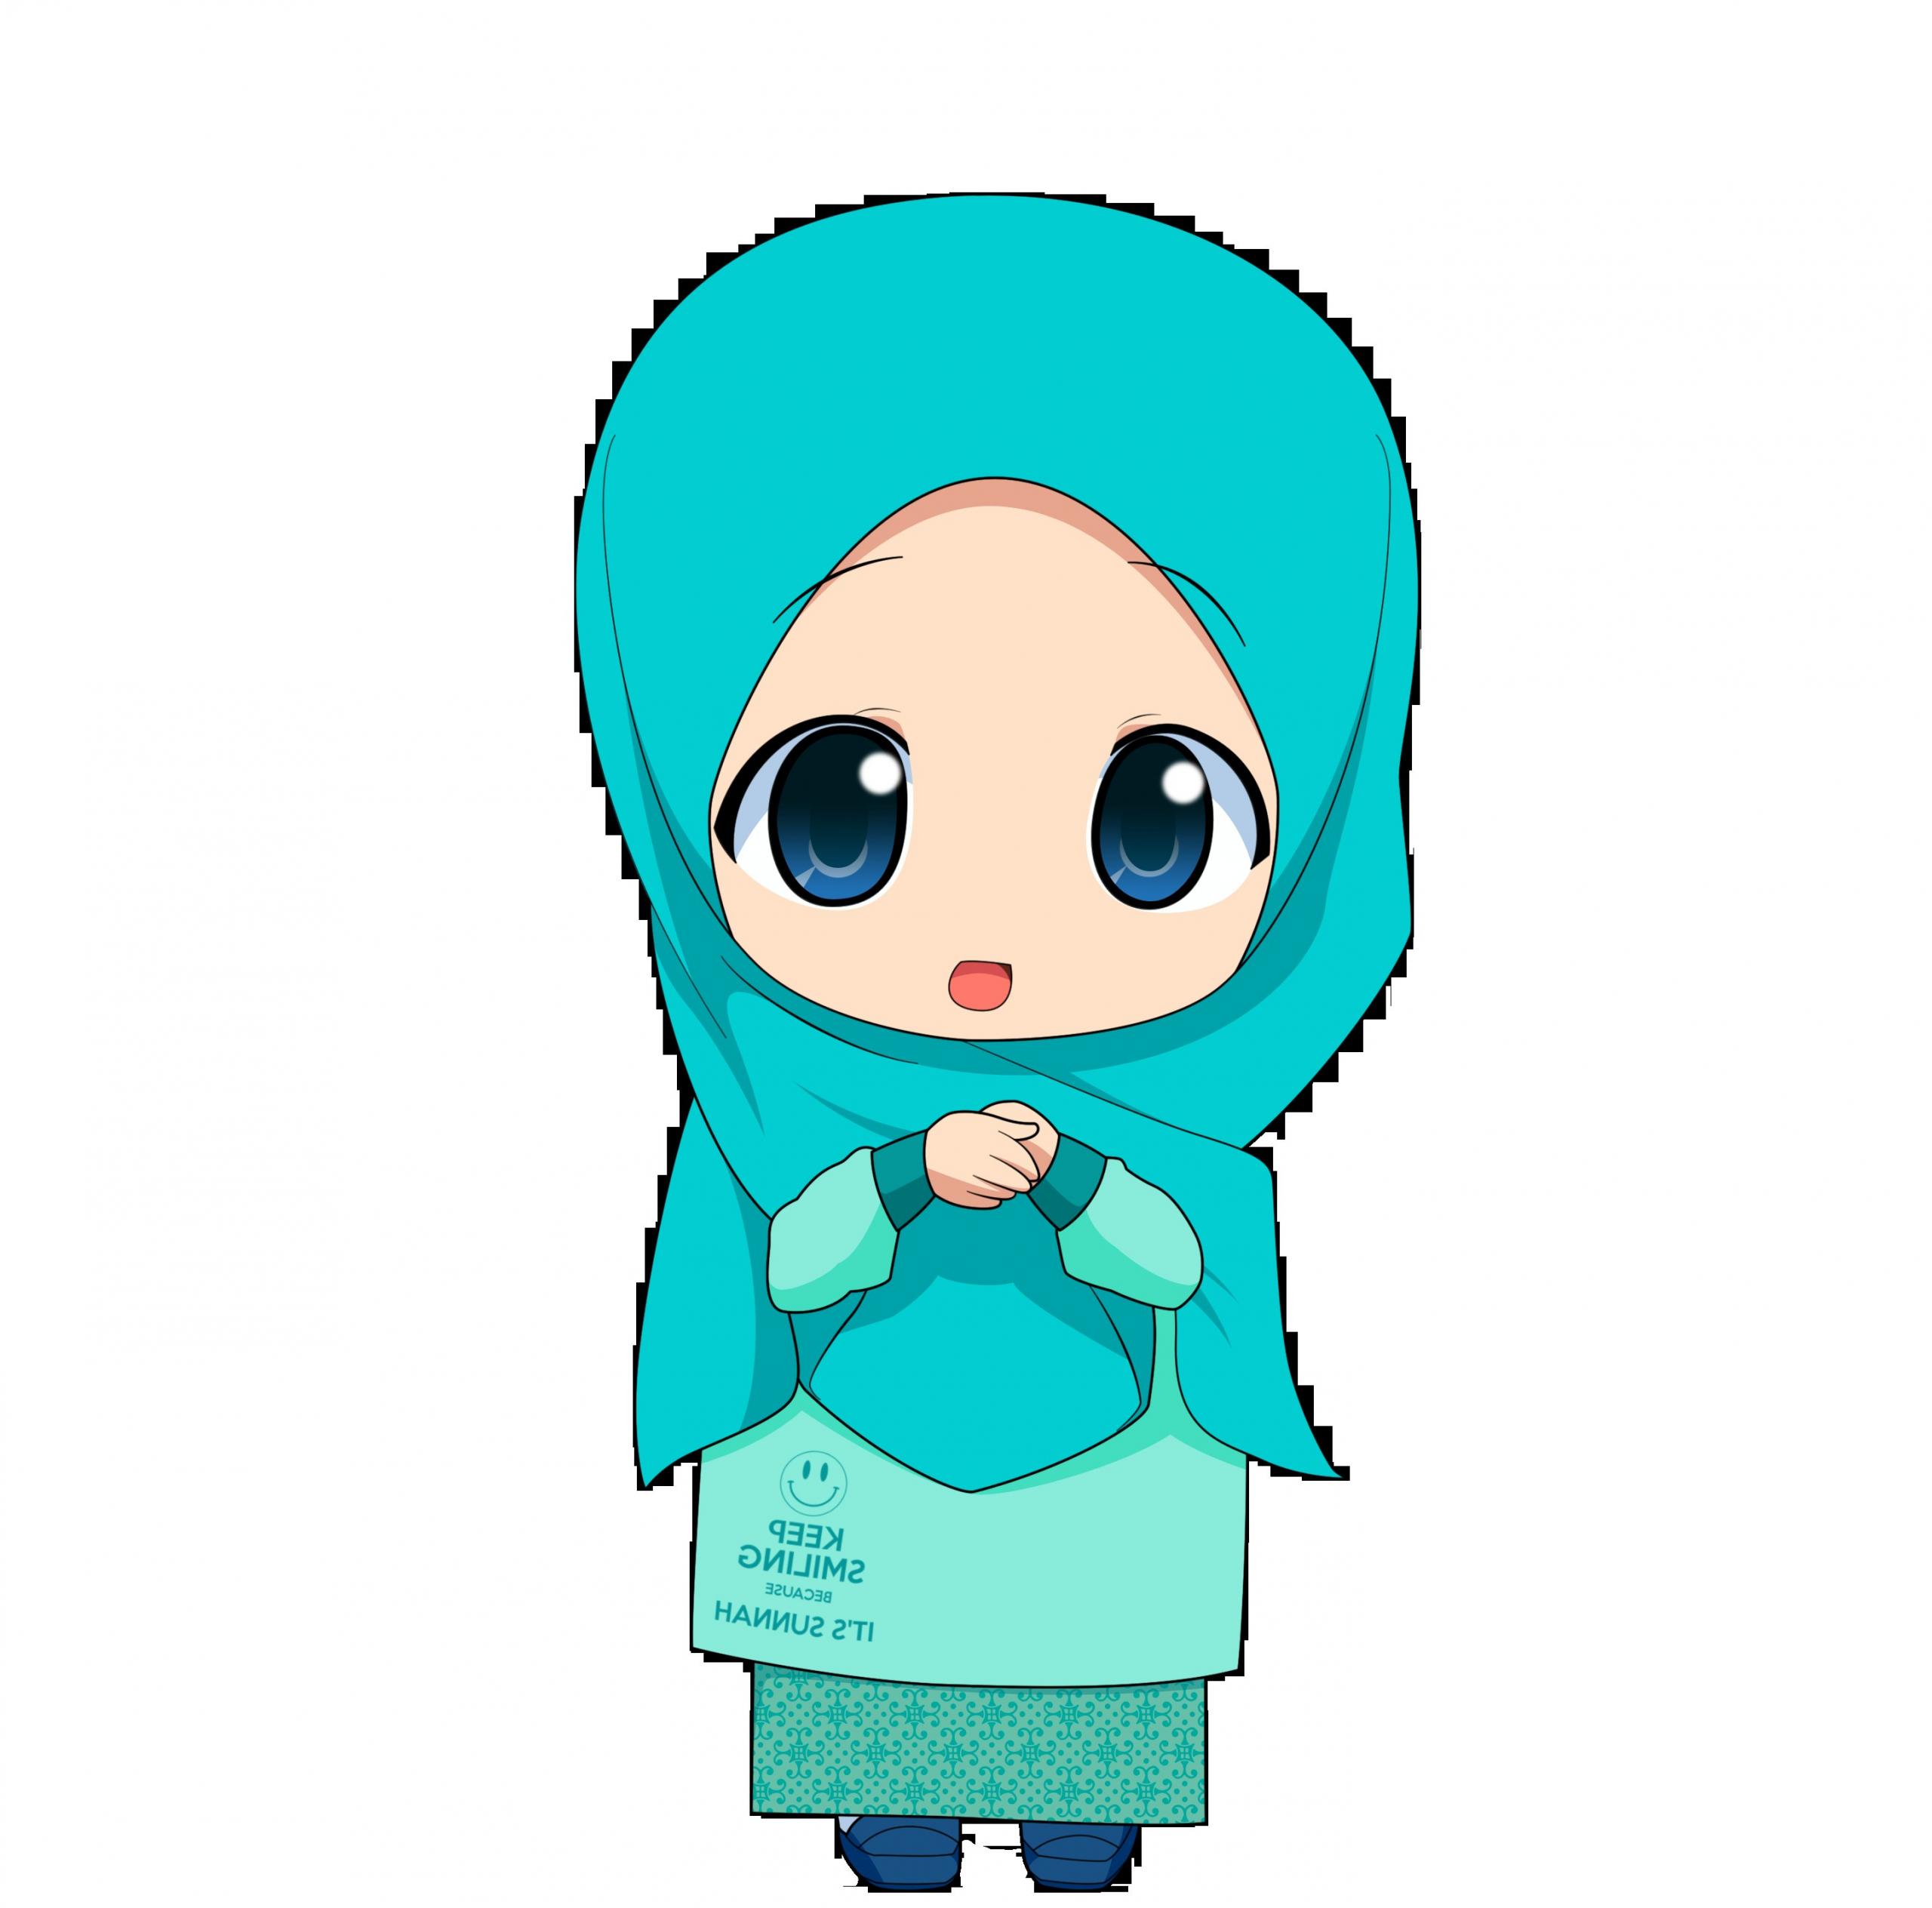 Inspirasi Muslimah Kartun Lucu Kvdd Gambar Kartun Muslimah Koleksi Gambar Hd